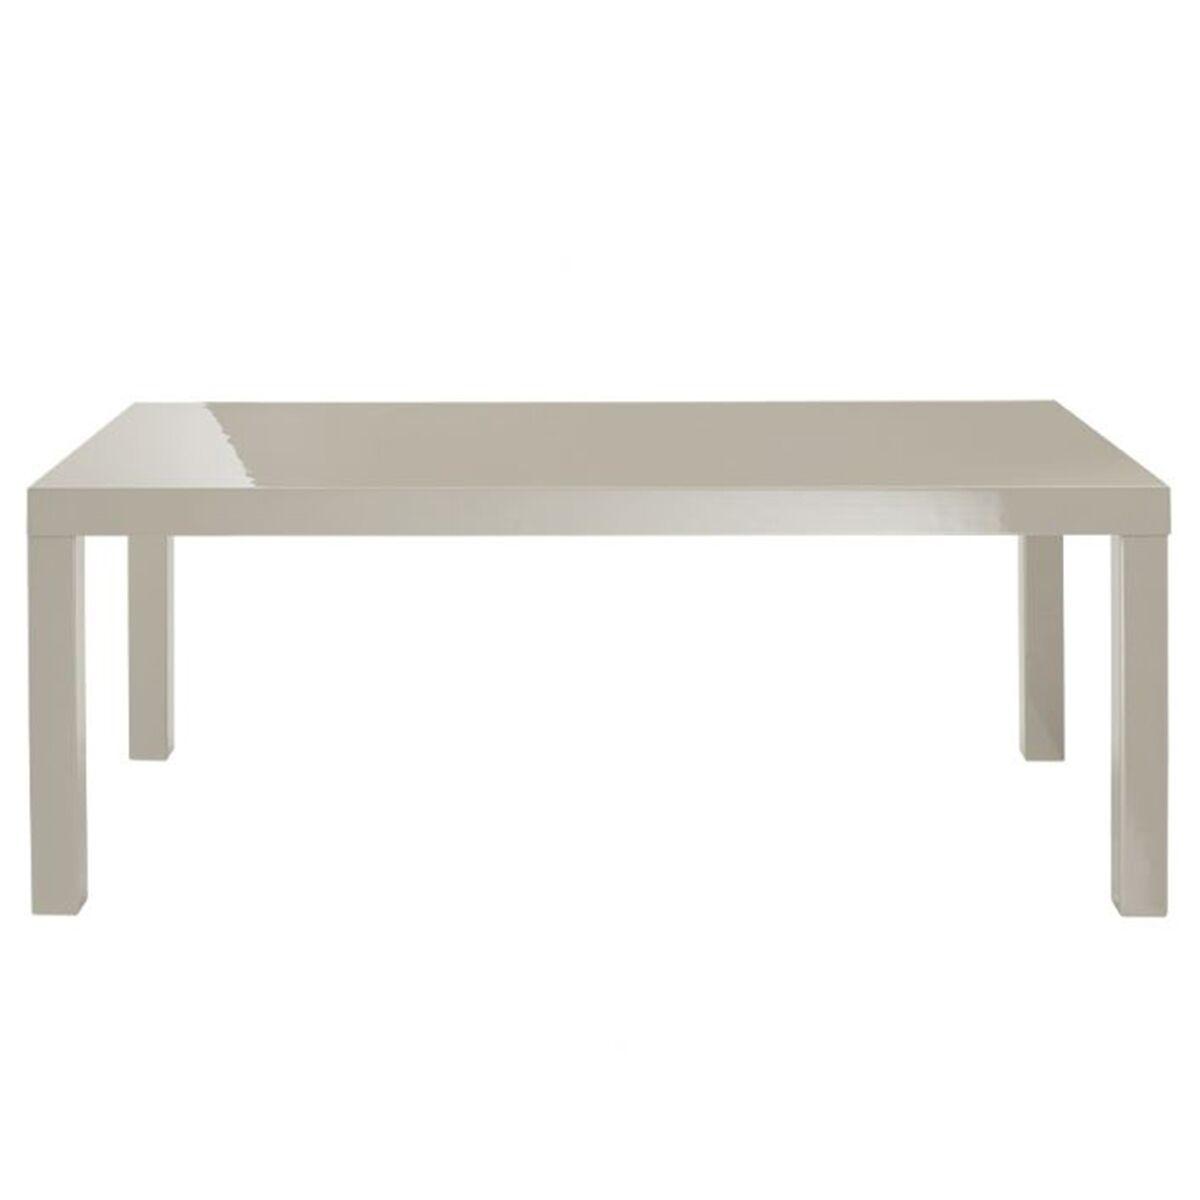 Puro High Gloss Coffee Table (Colour: Stone)